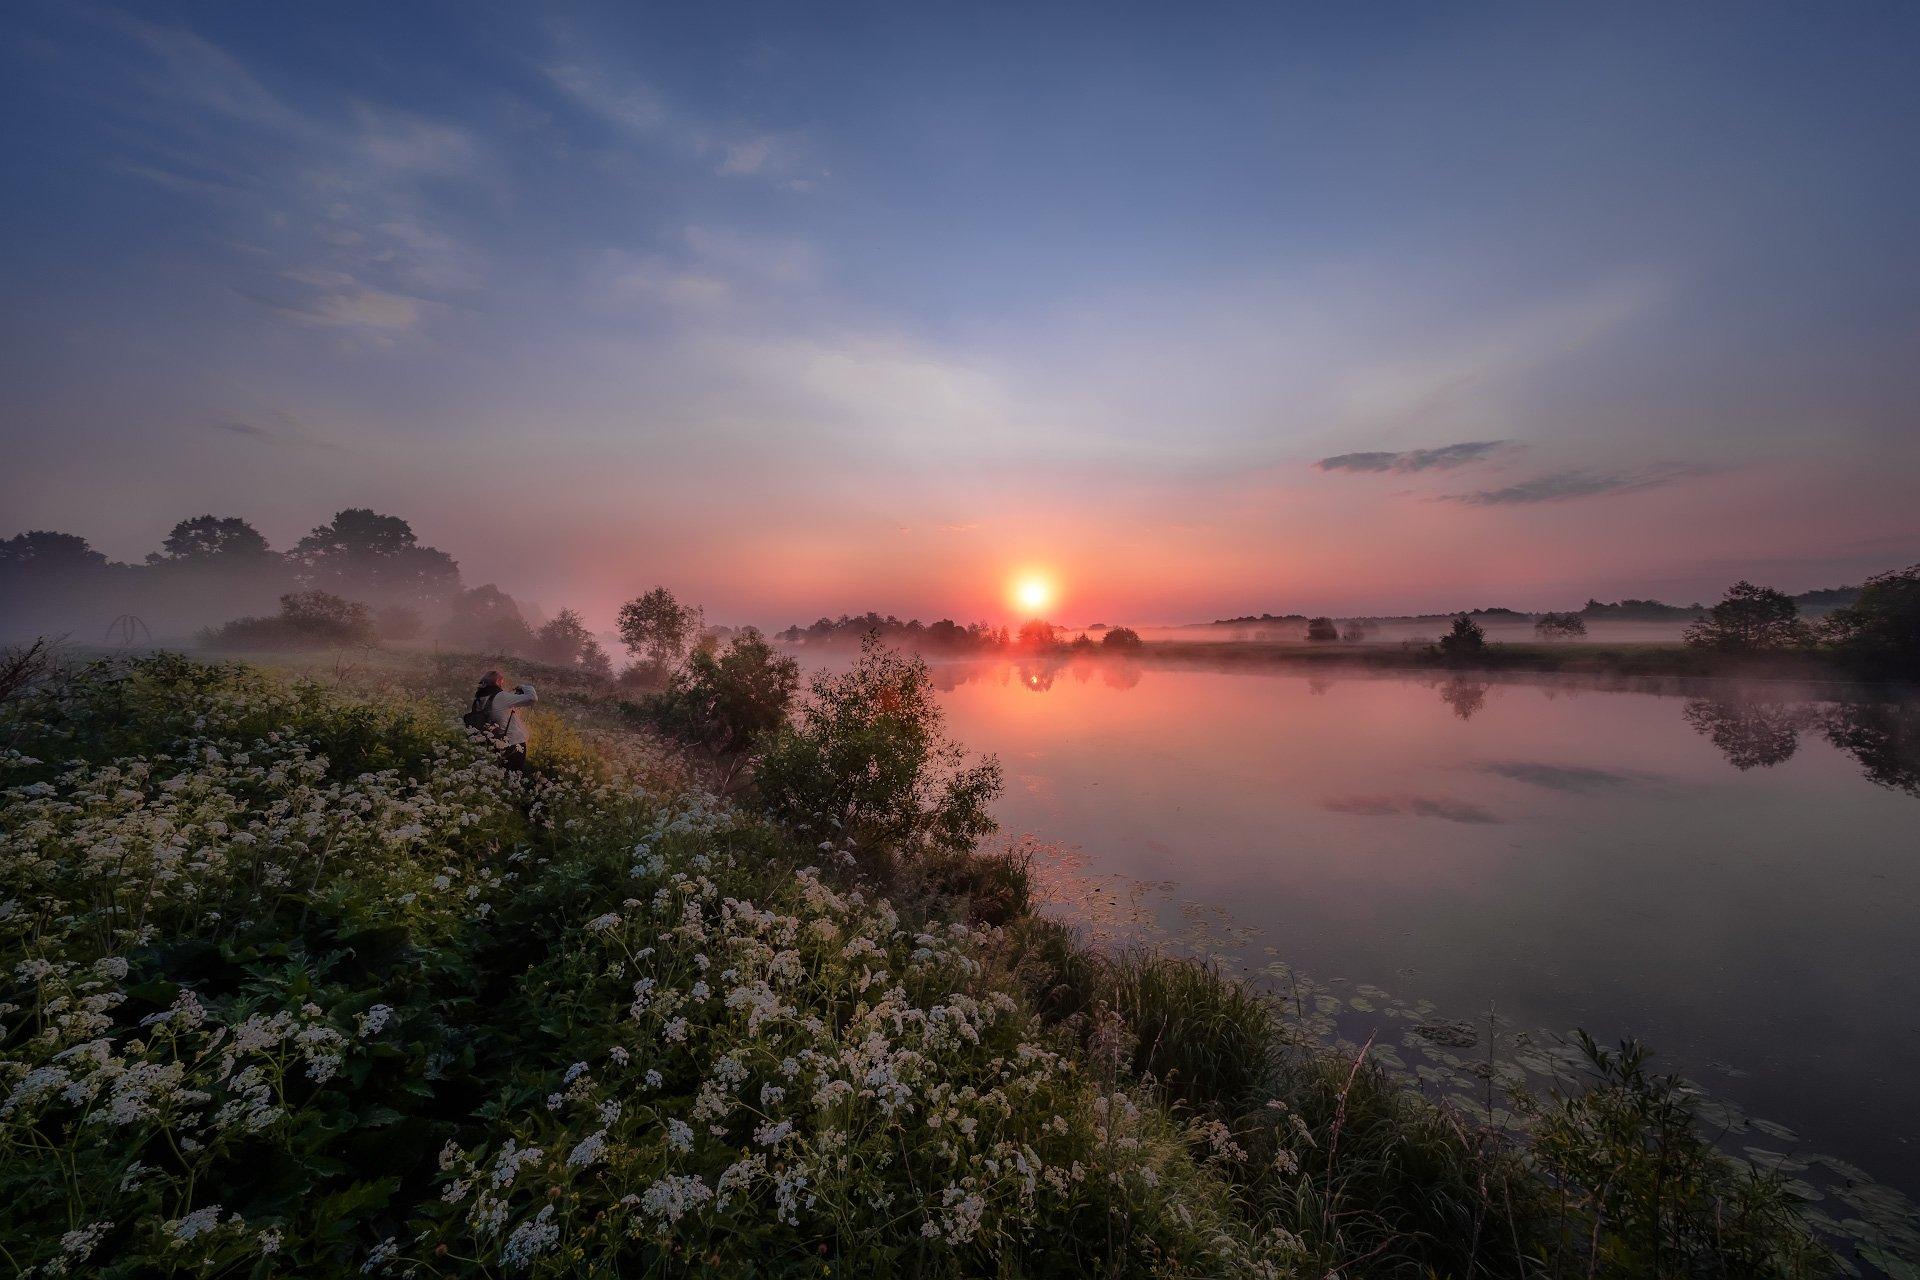 дубна, река, утро, рассвет, фотограф, девушка, туман, цветы, небо, солнце, свет, Андрей Чиж